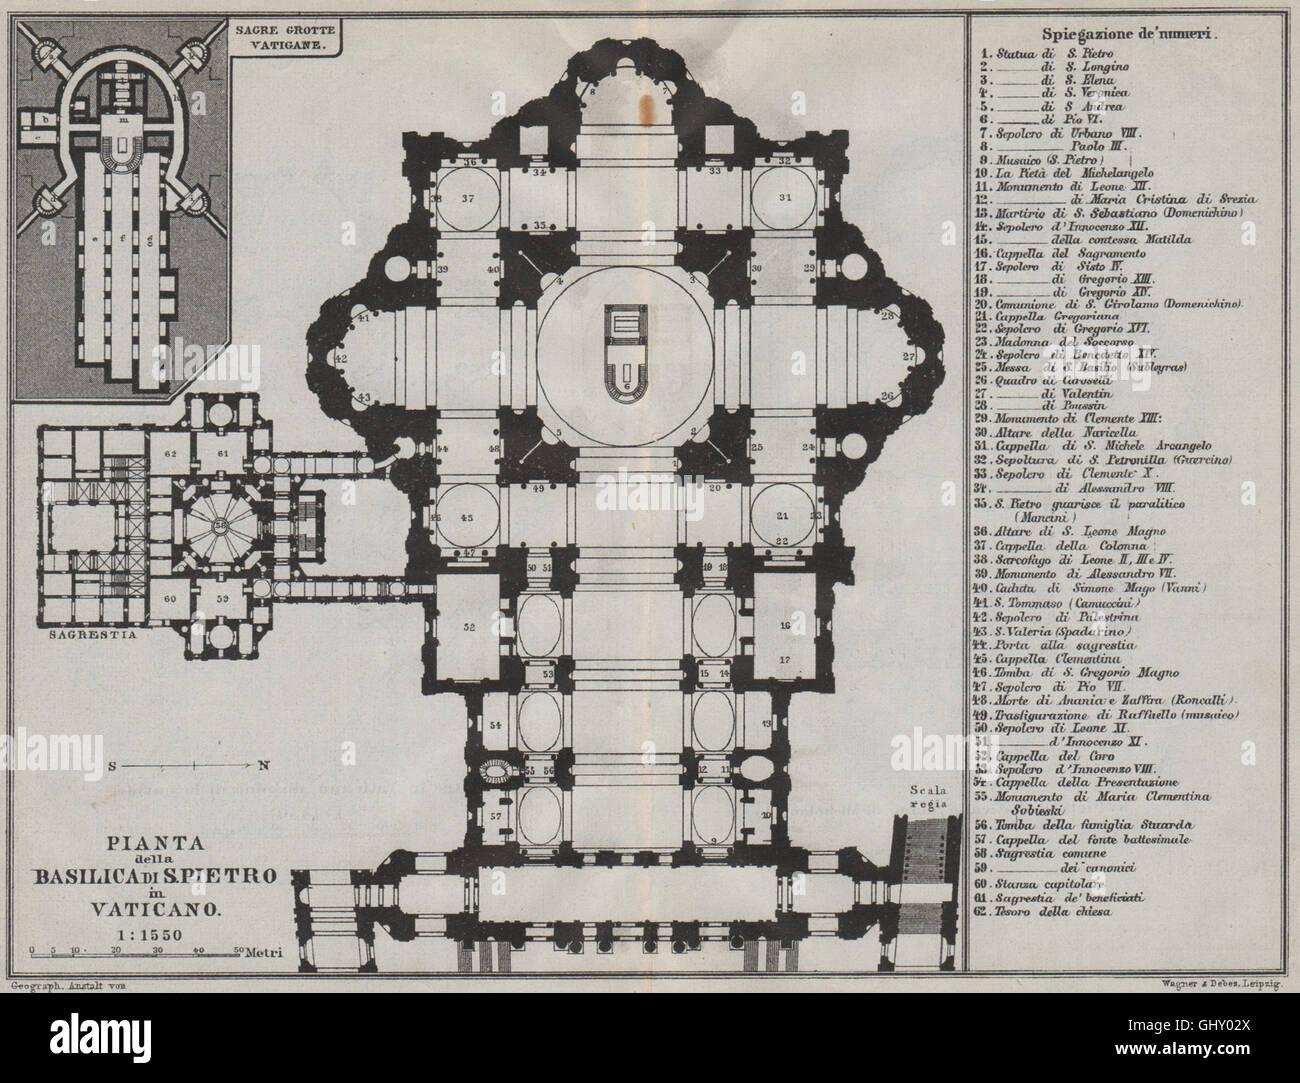 hight resolution of basilica di san pietro in vaticano pianta floor plan 1909